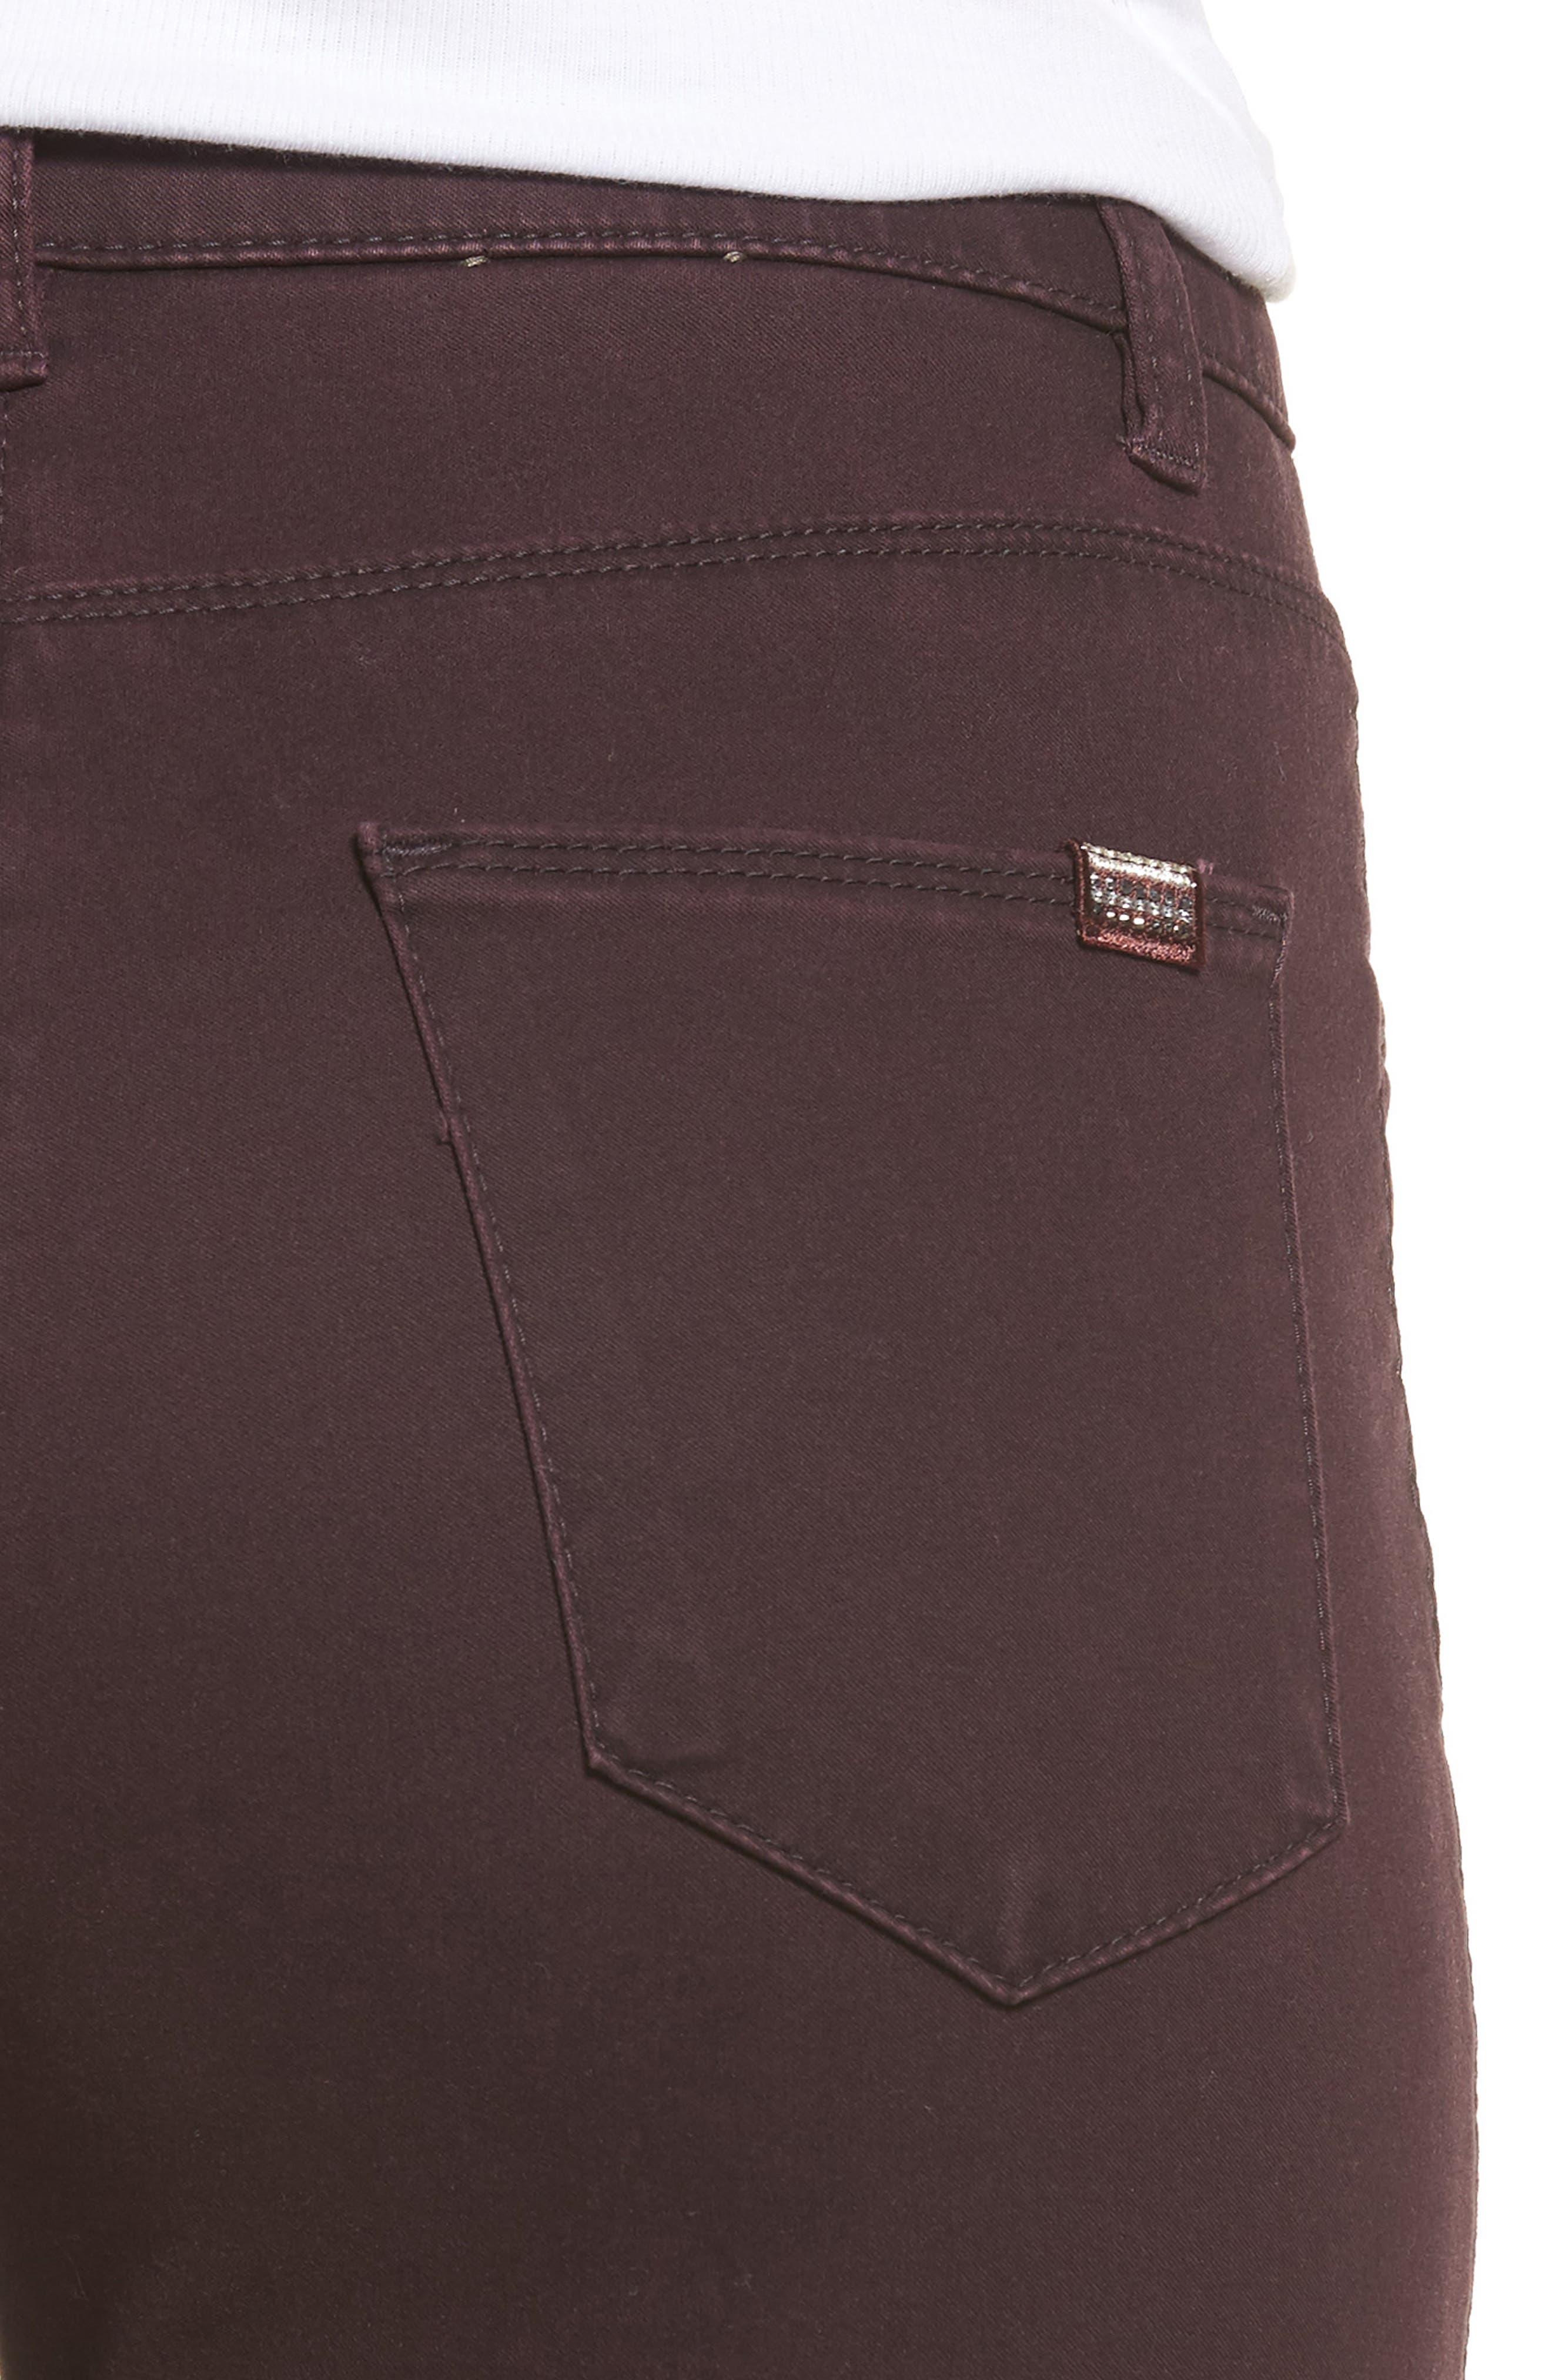 Straight Leg Pants,                             Alternate thumbnail 4, color,                             Amarone